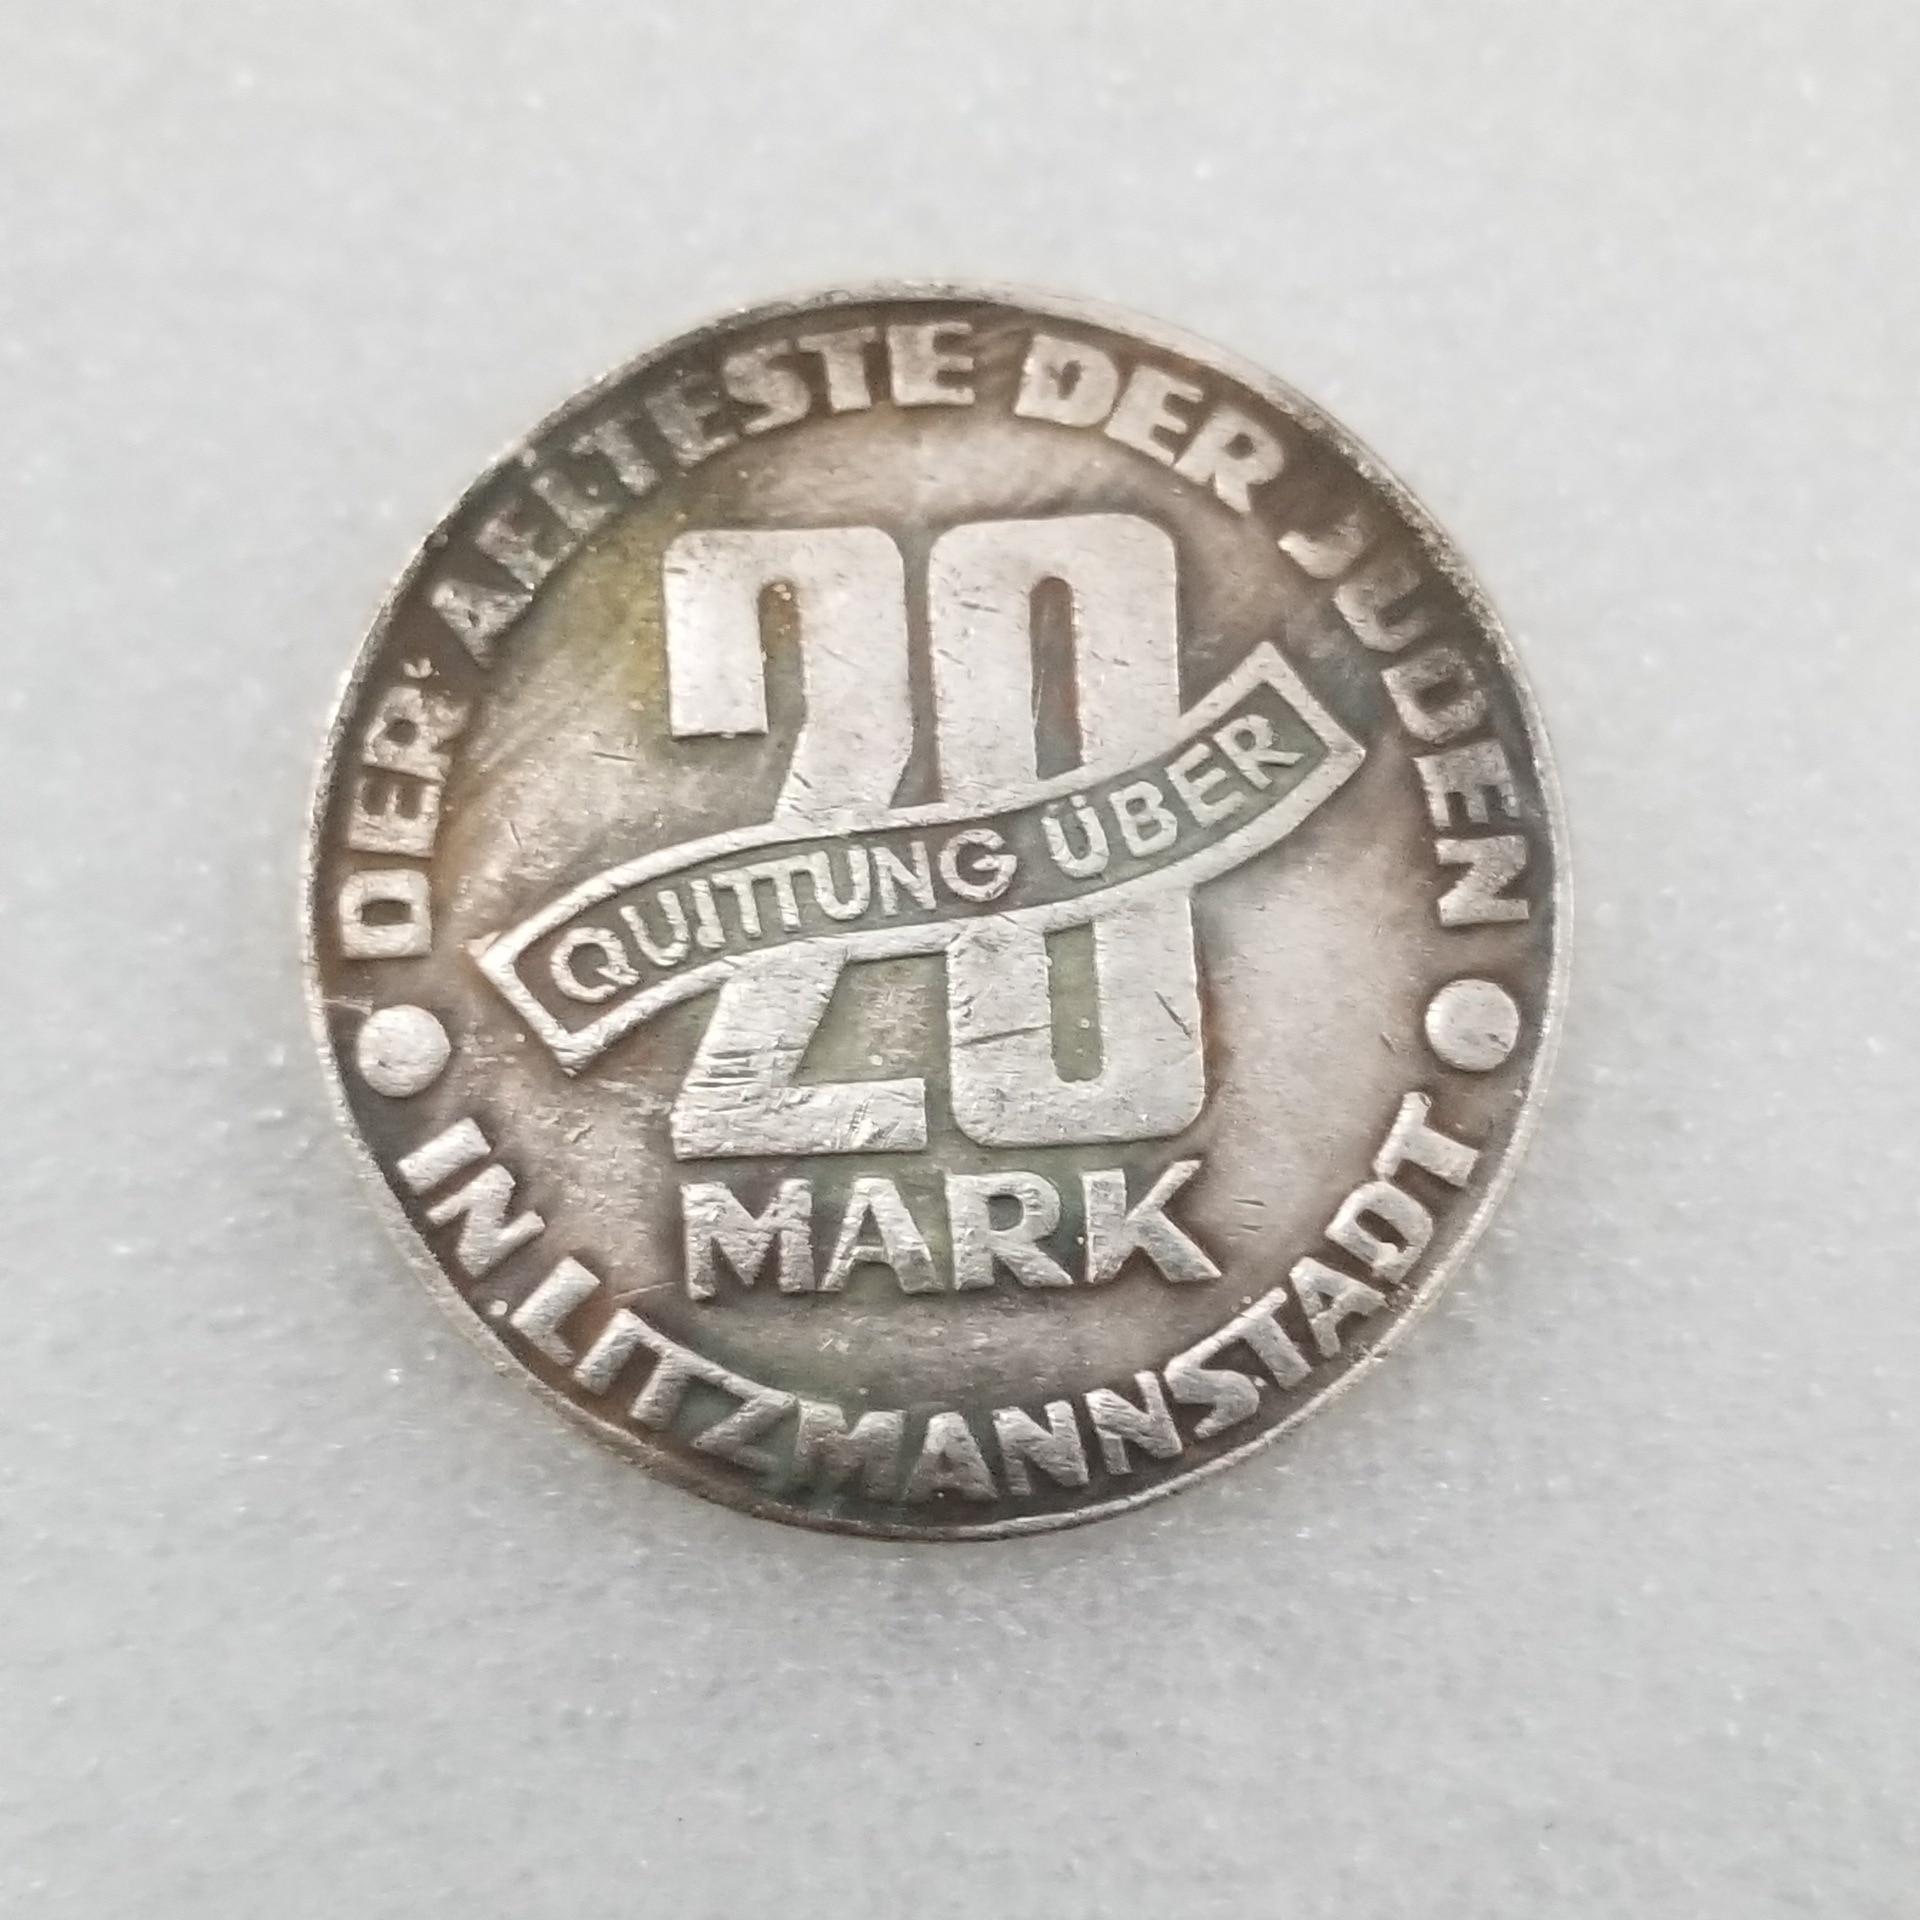 1943 20 marcas de monedas de Polonia monedas antiguas moneda conmemorativa de regalo envío gratis